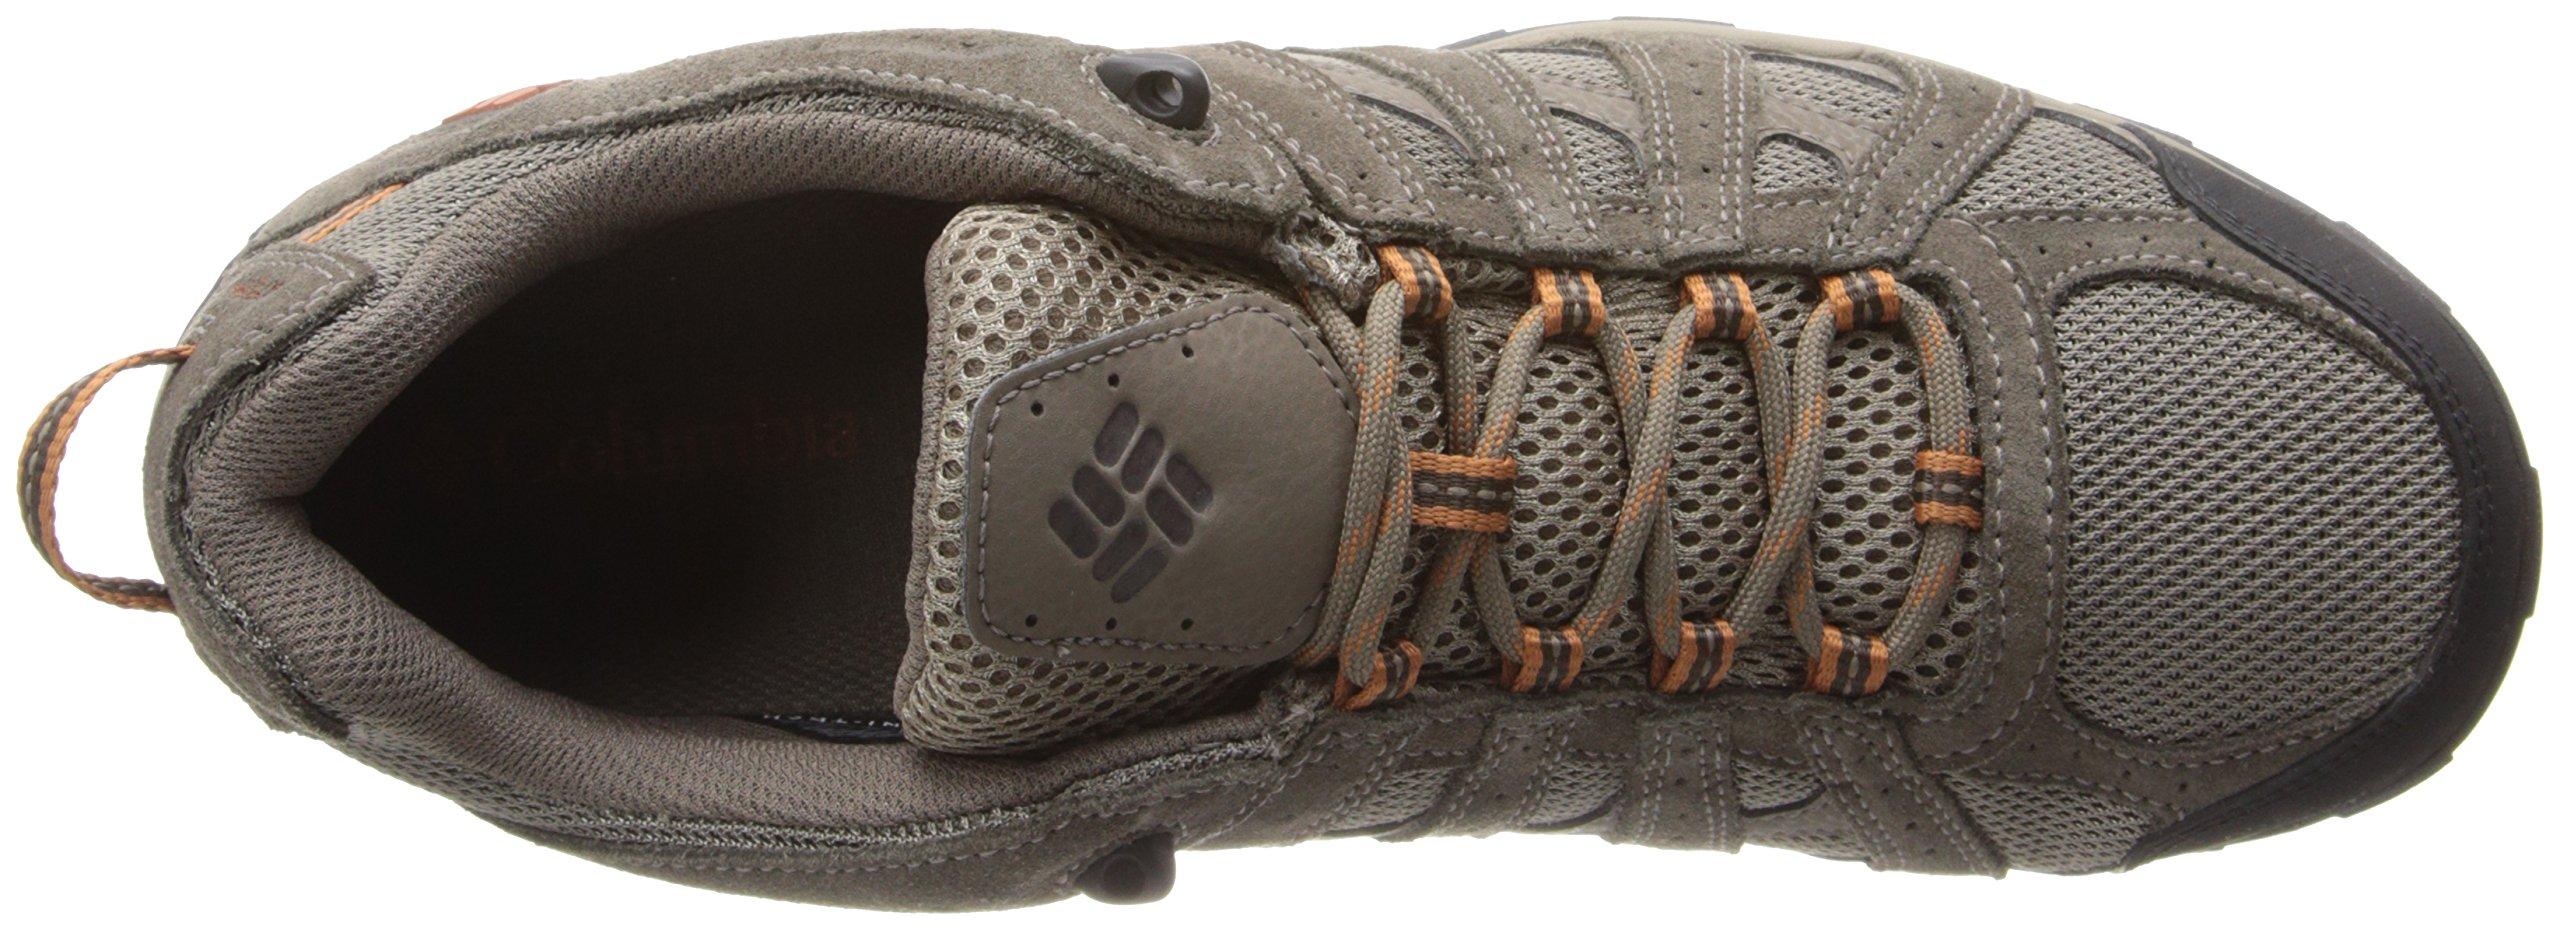 Columbia Men's Redmond Waterproof Hiking Shoe Pebble, Dark Ginger 7 D US by Columbia (Image #8)